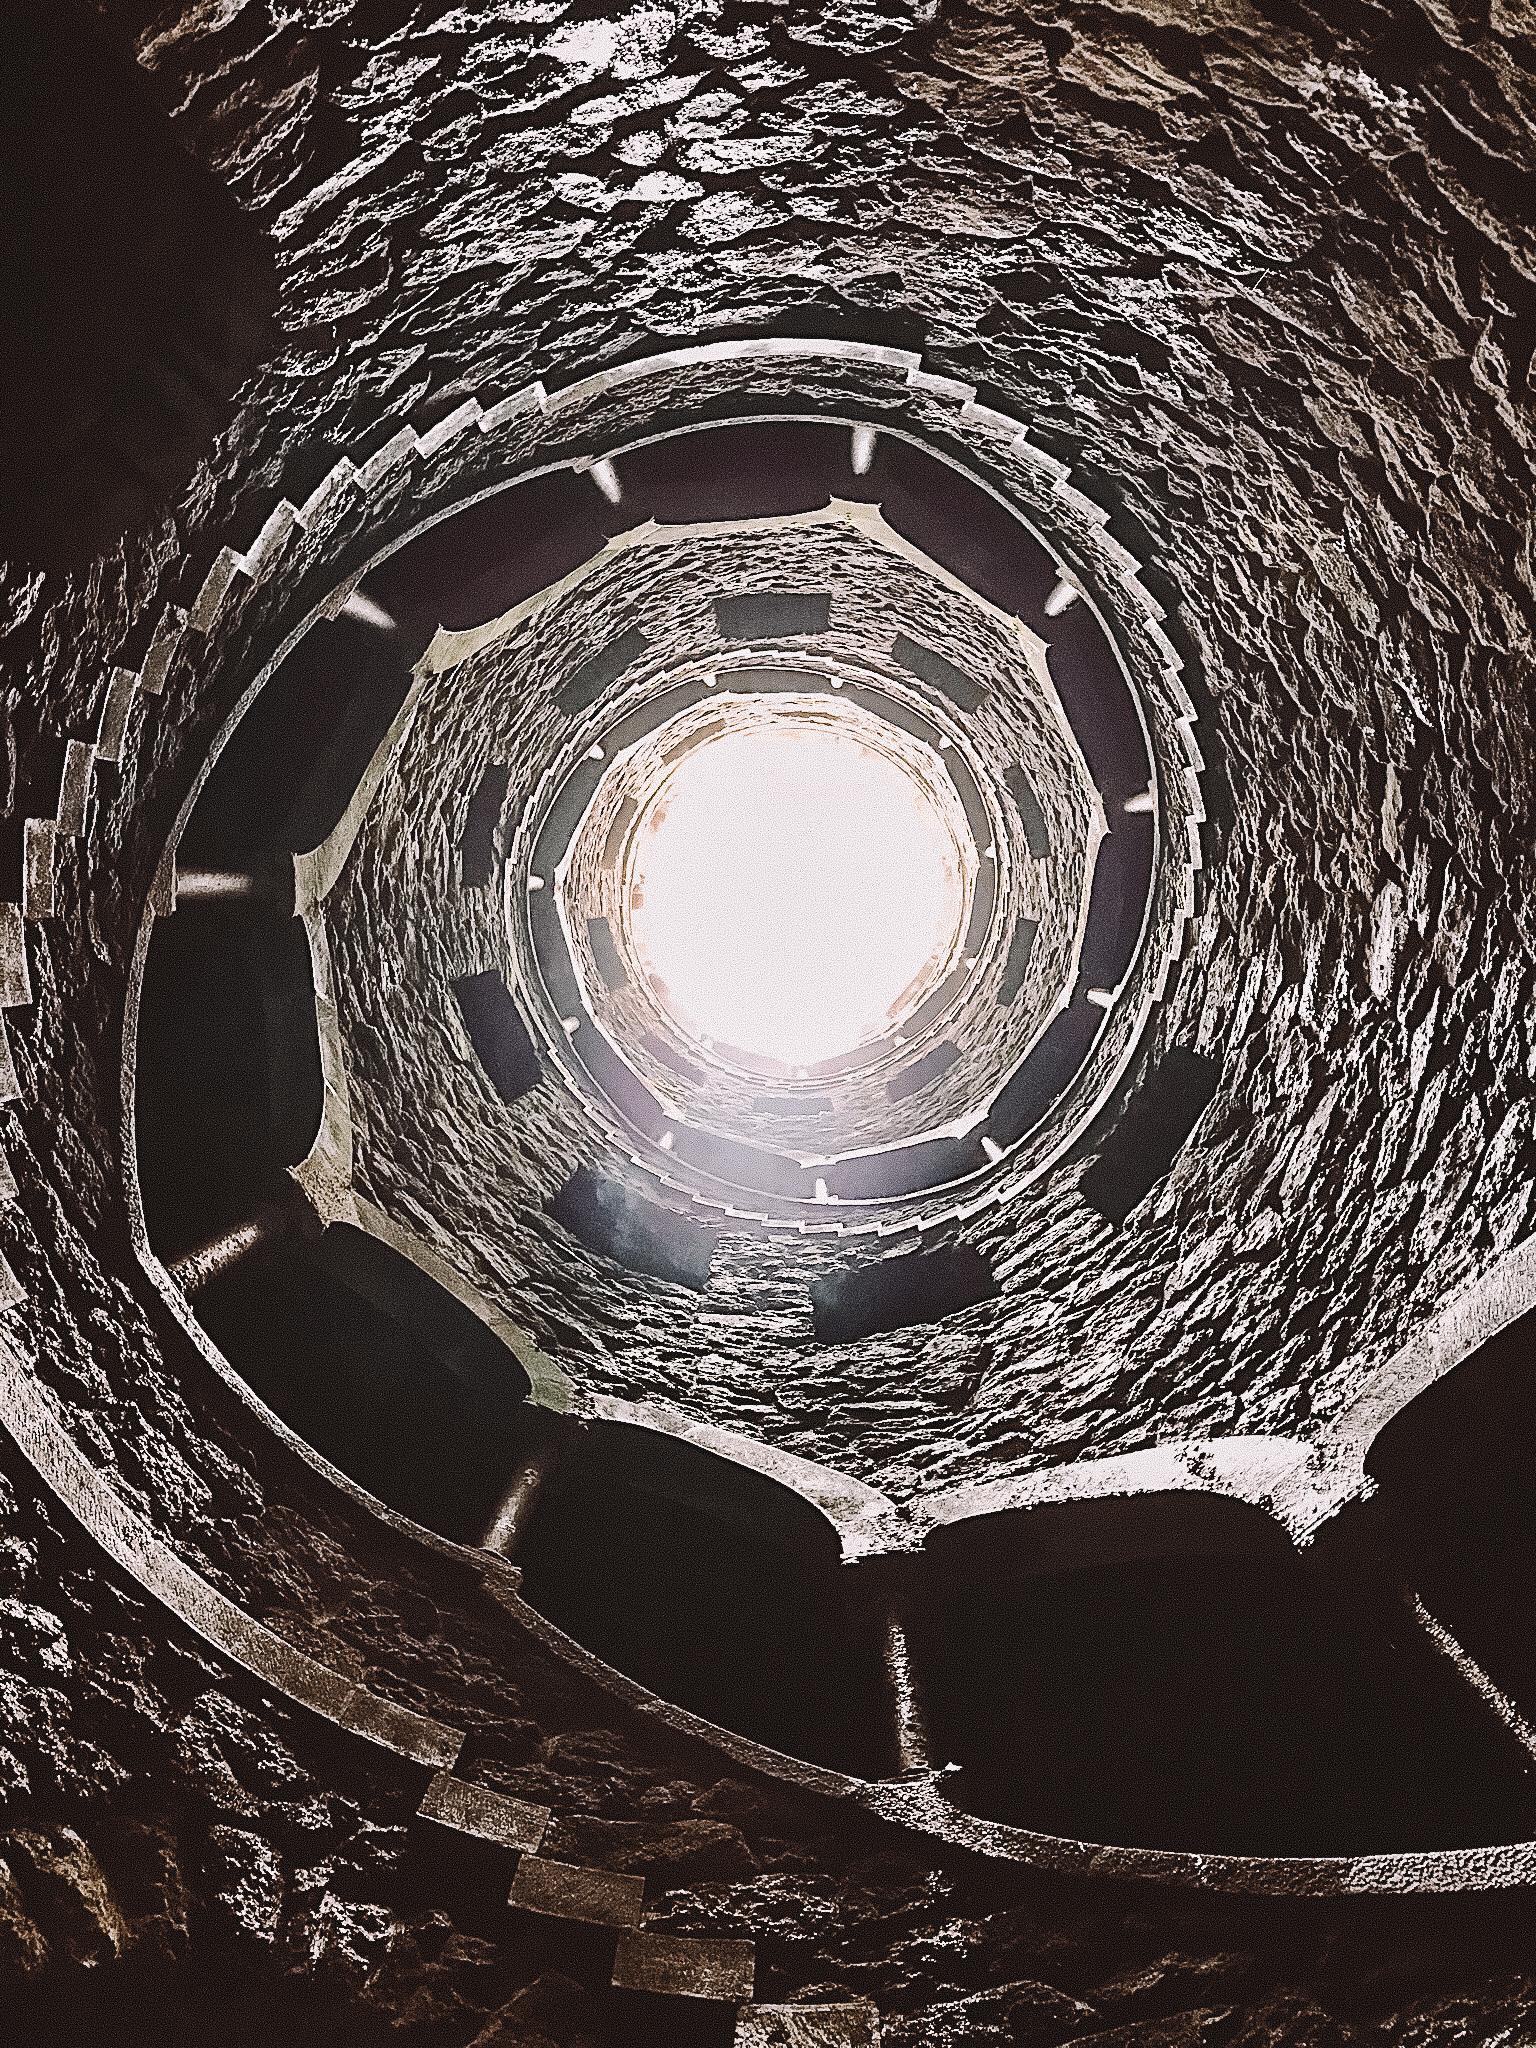 Quinta-da-Regaleira-underground-caves-wells